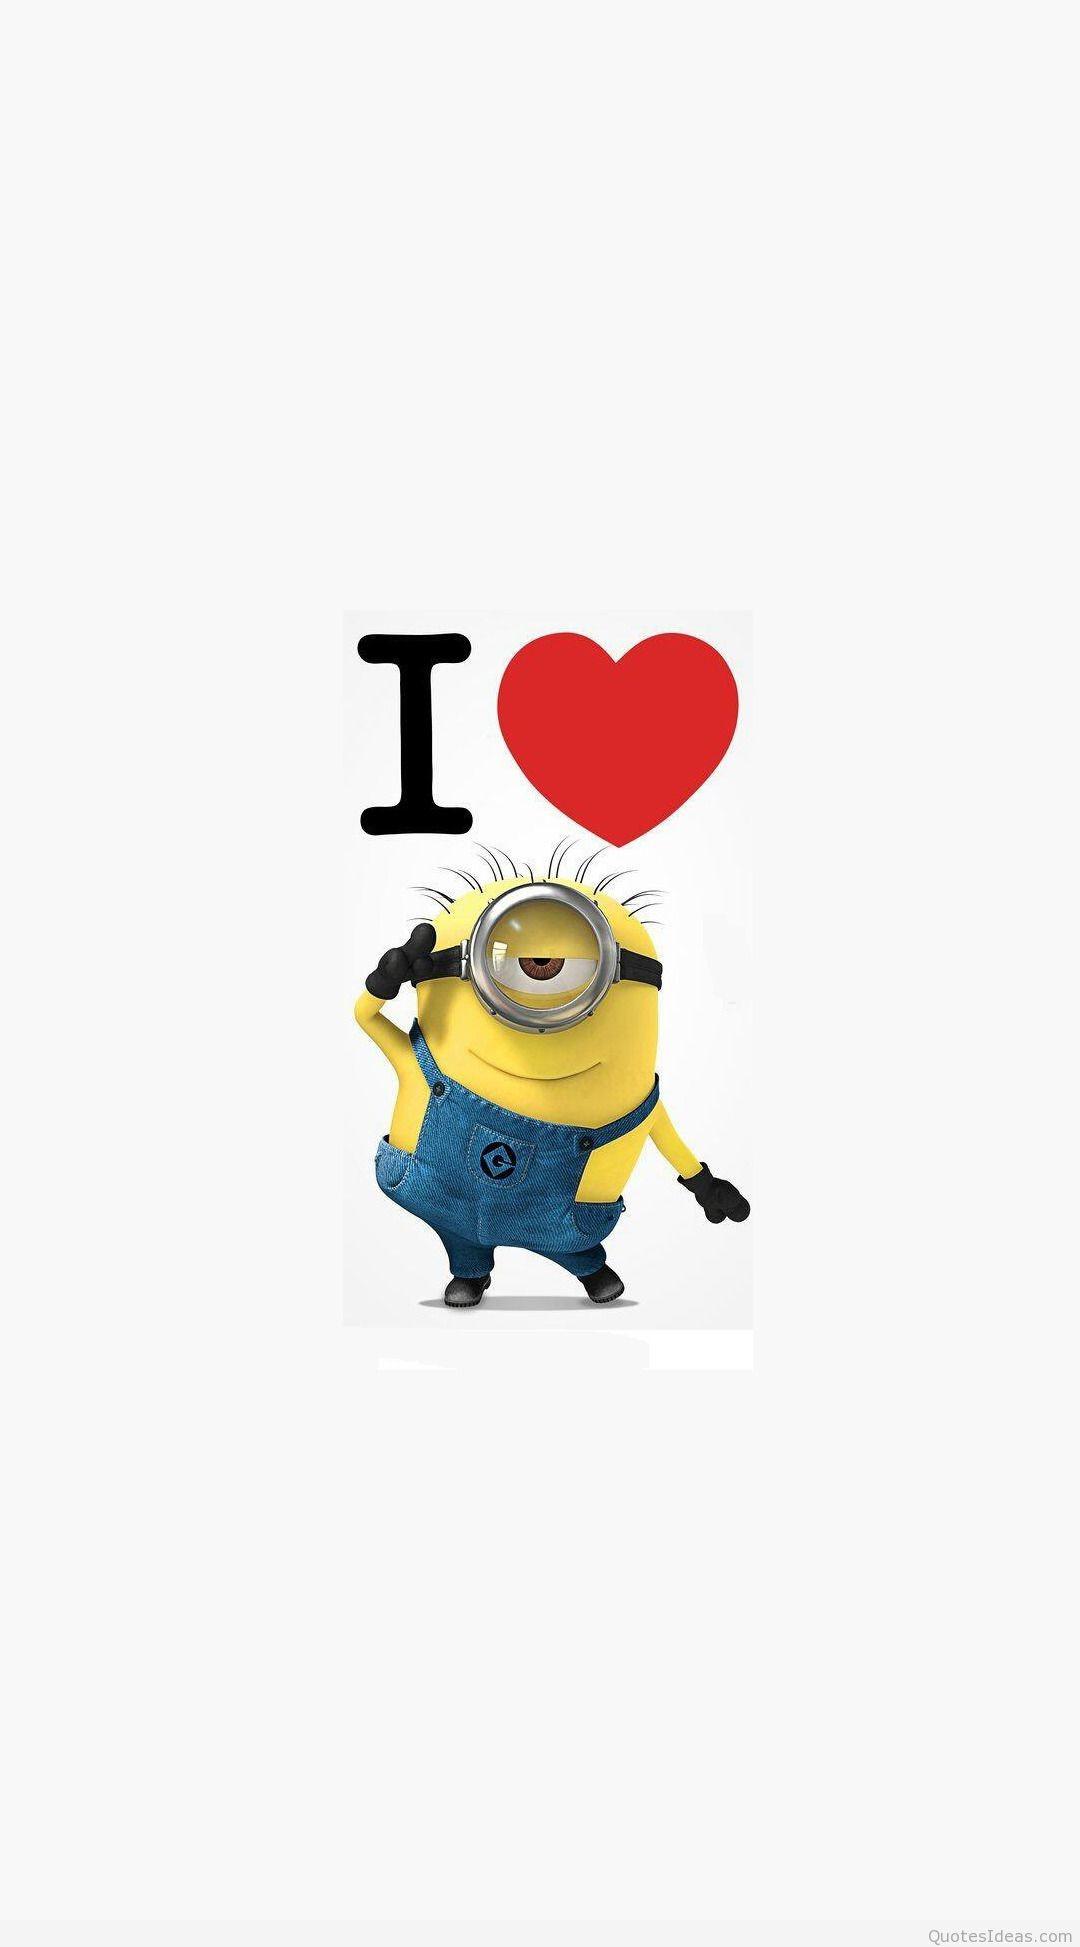 … i-love-minions-cartoon-mobile-wallpaper-1080×1920-2446- …